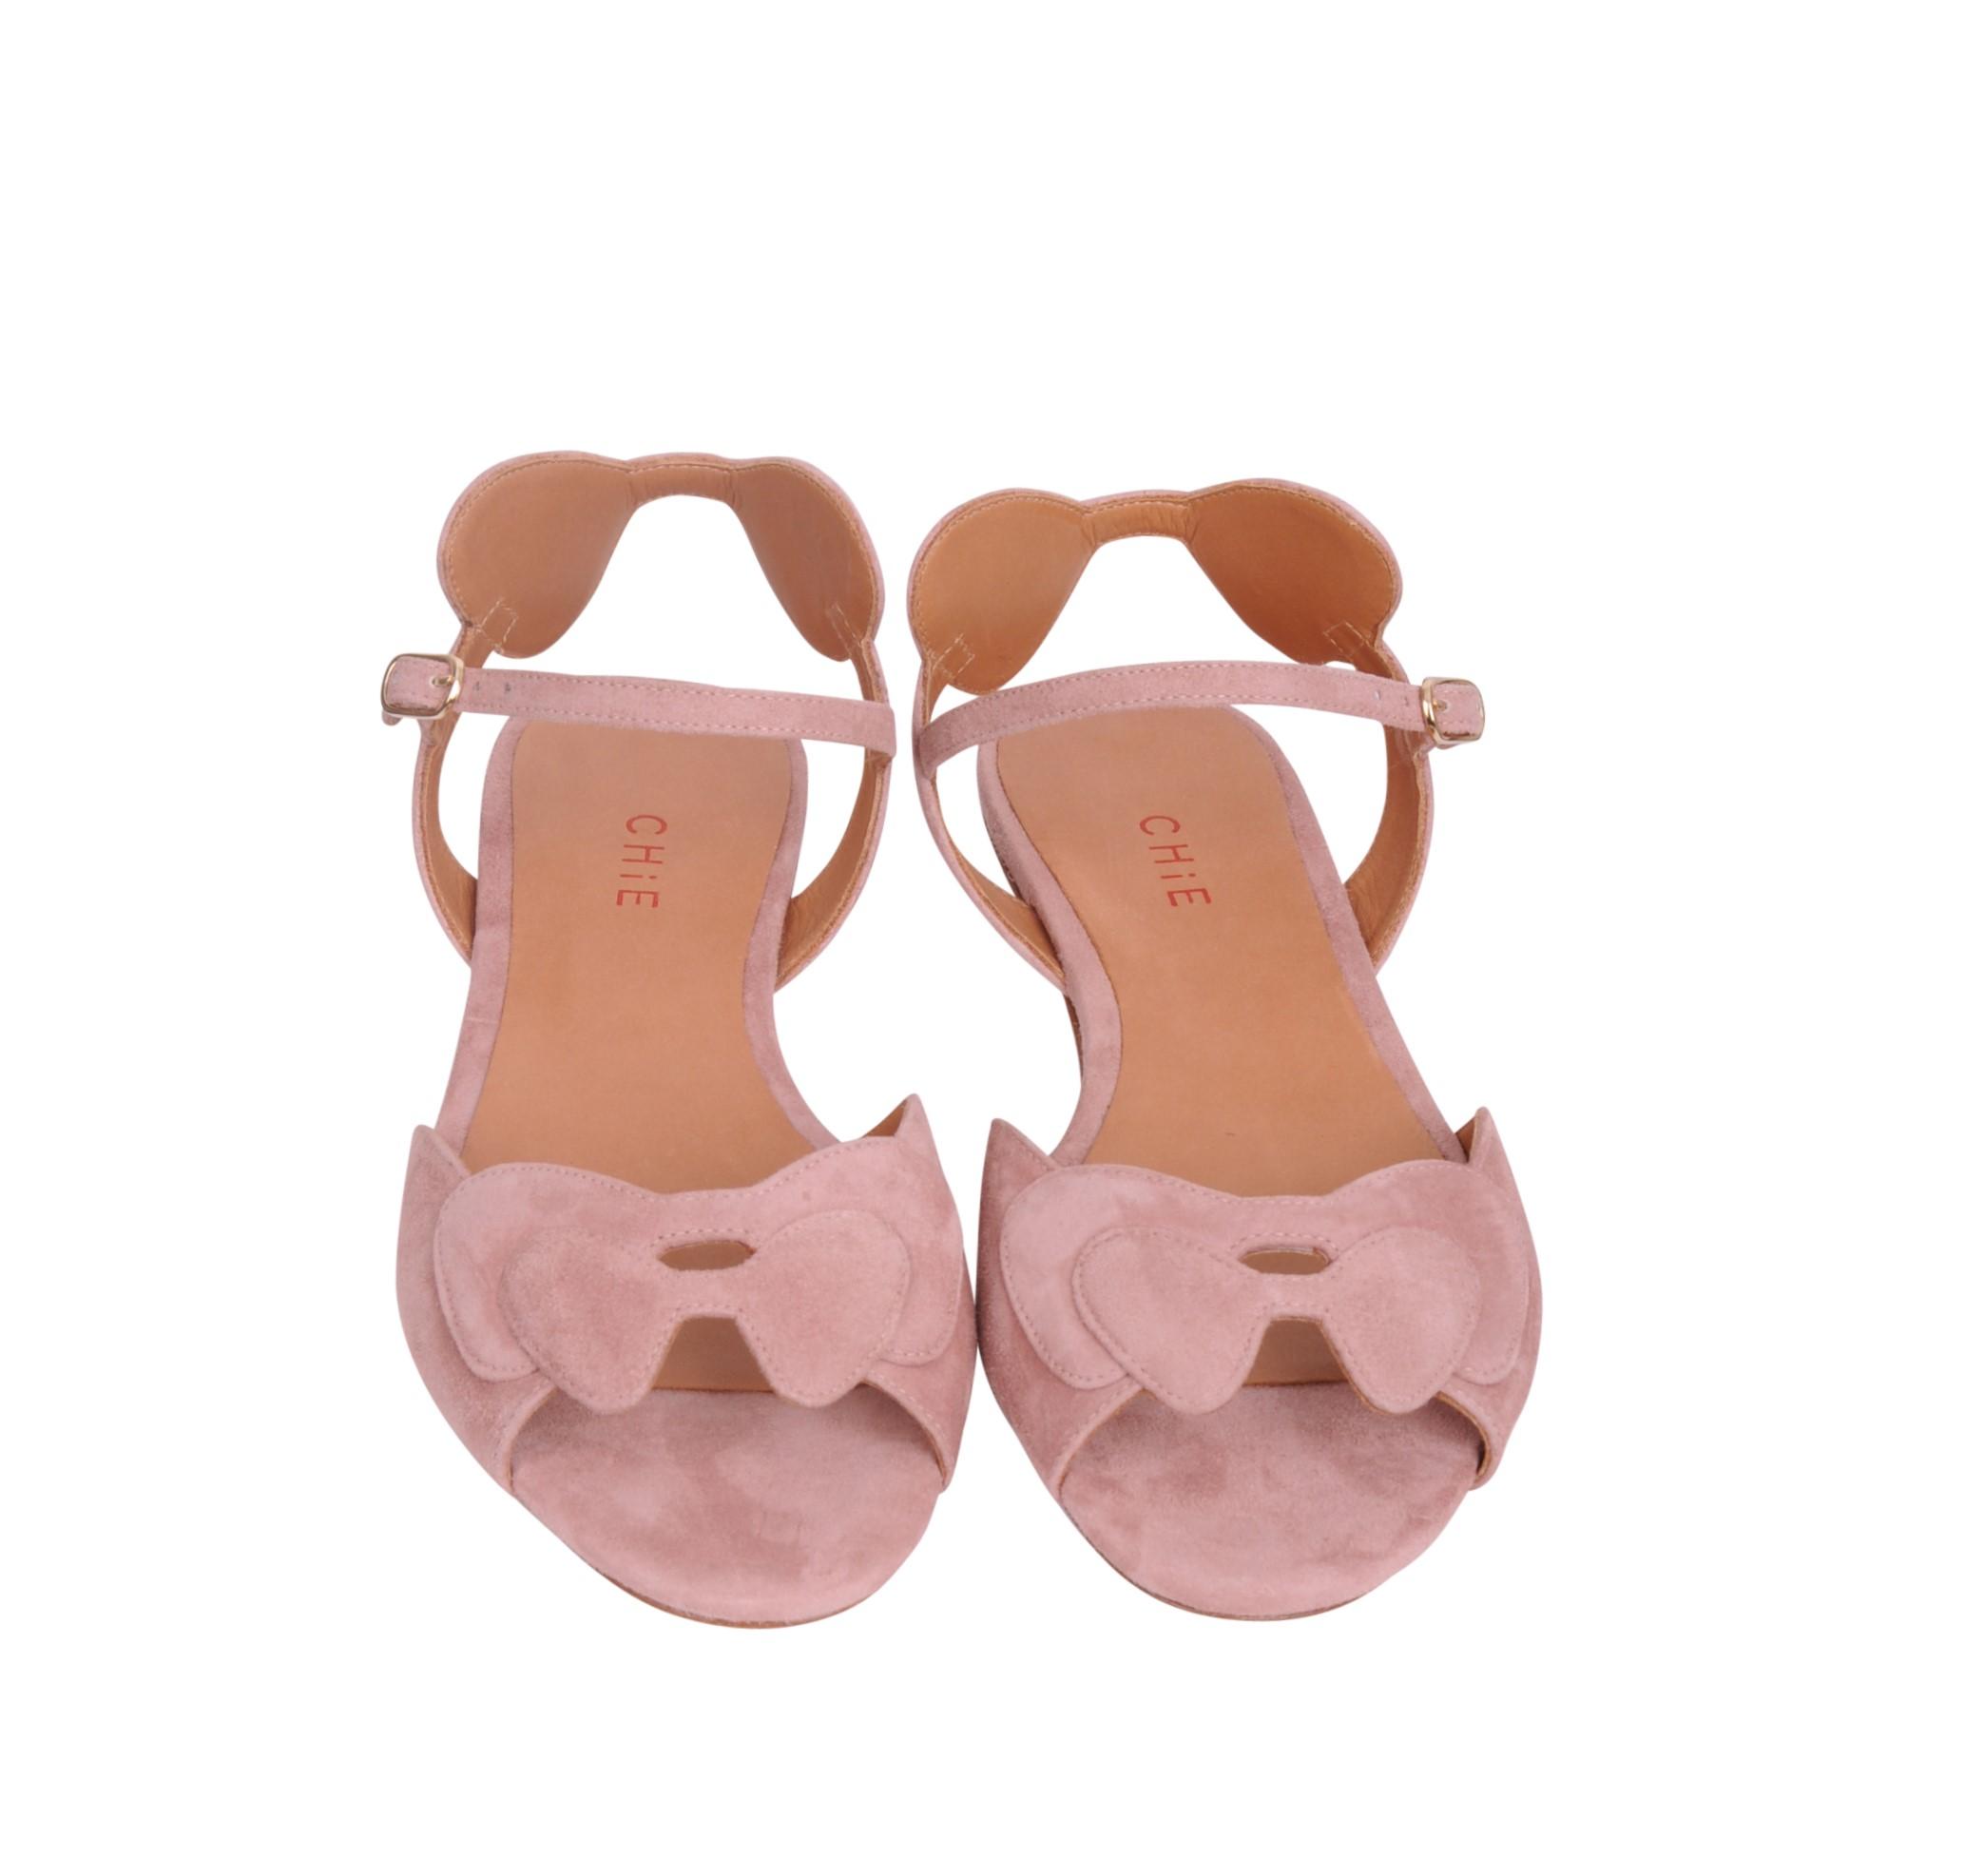 Mihara Mit Chie Chie Schleifendetails Sandale Mihara Sandale rQCtdsh